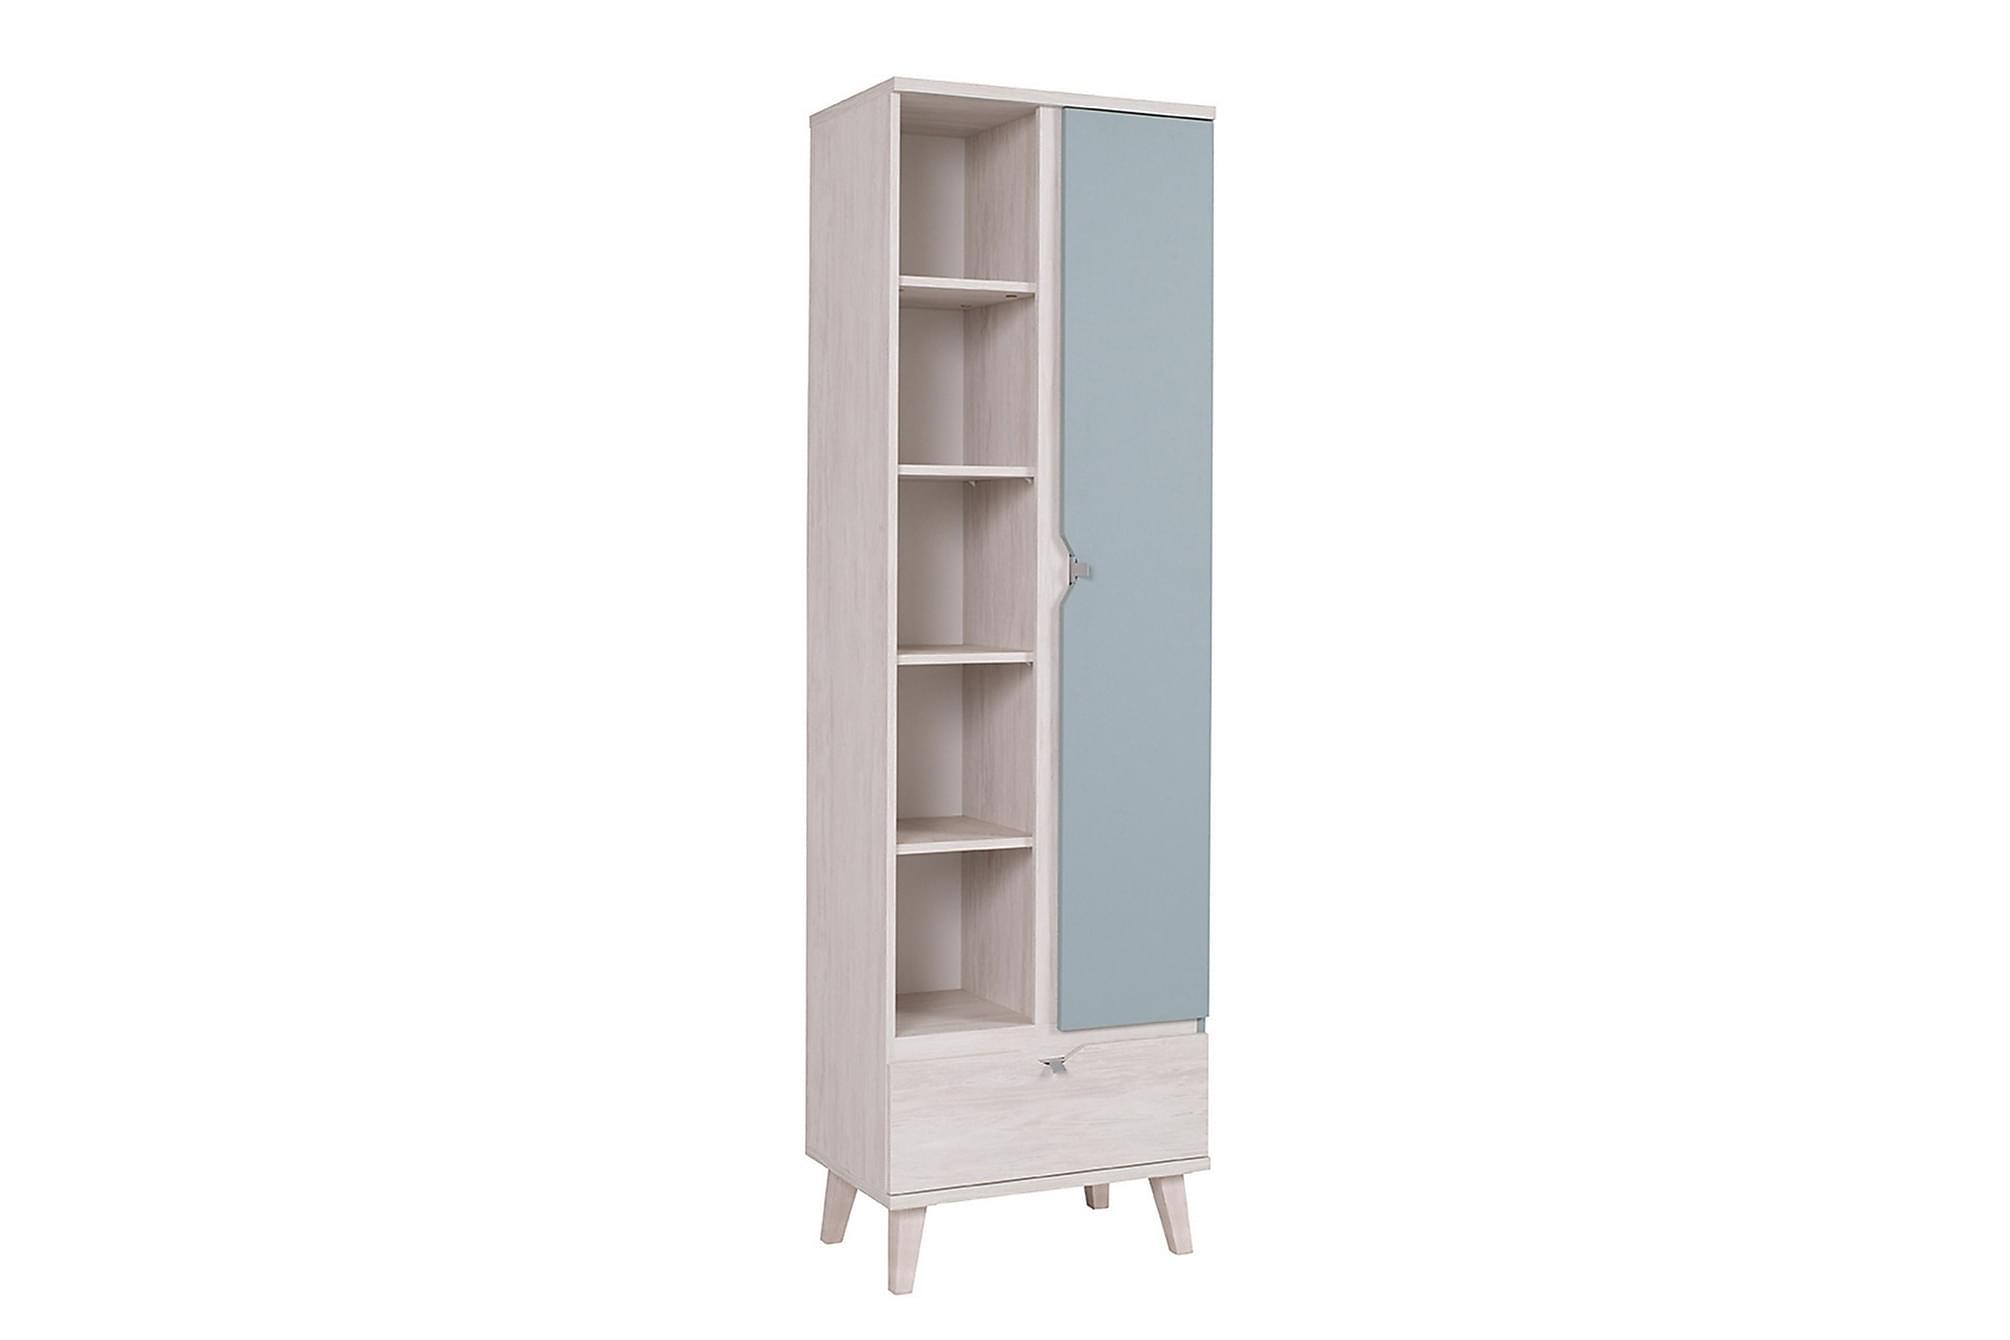 Norrhace bokhylla 60 vit/blå